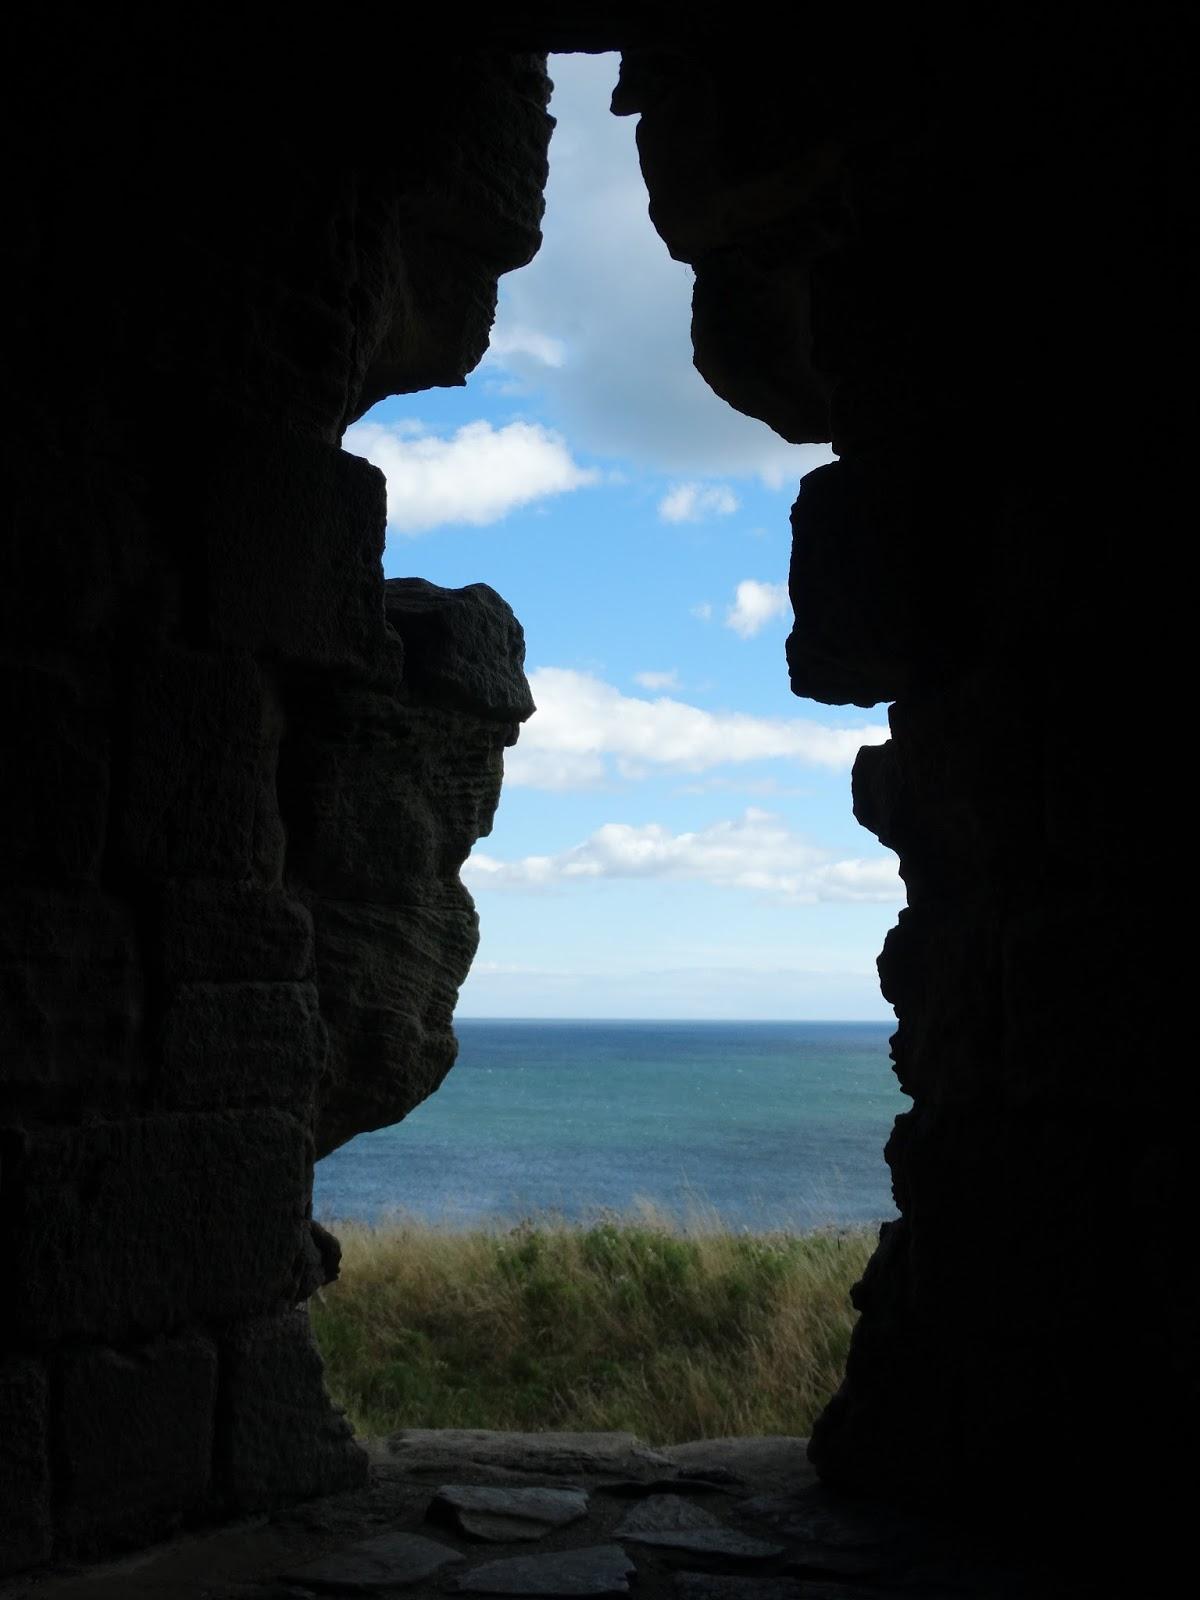 Sea Through Window